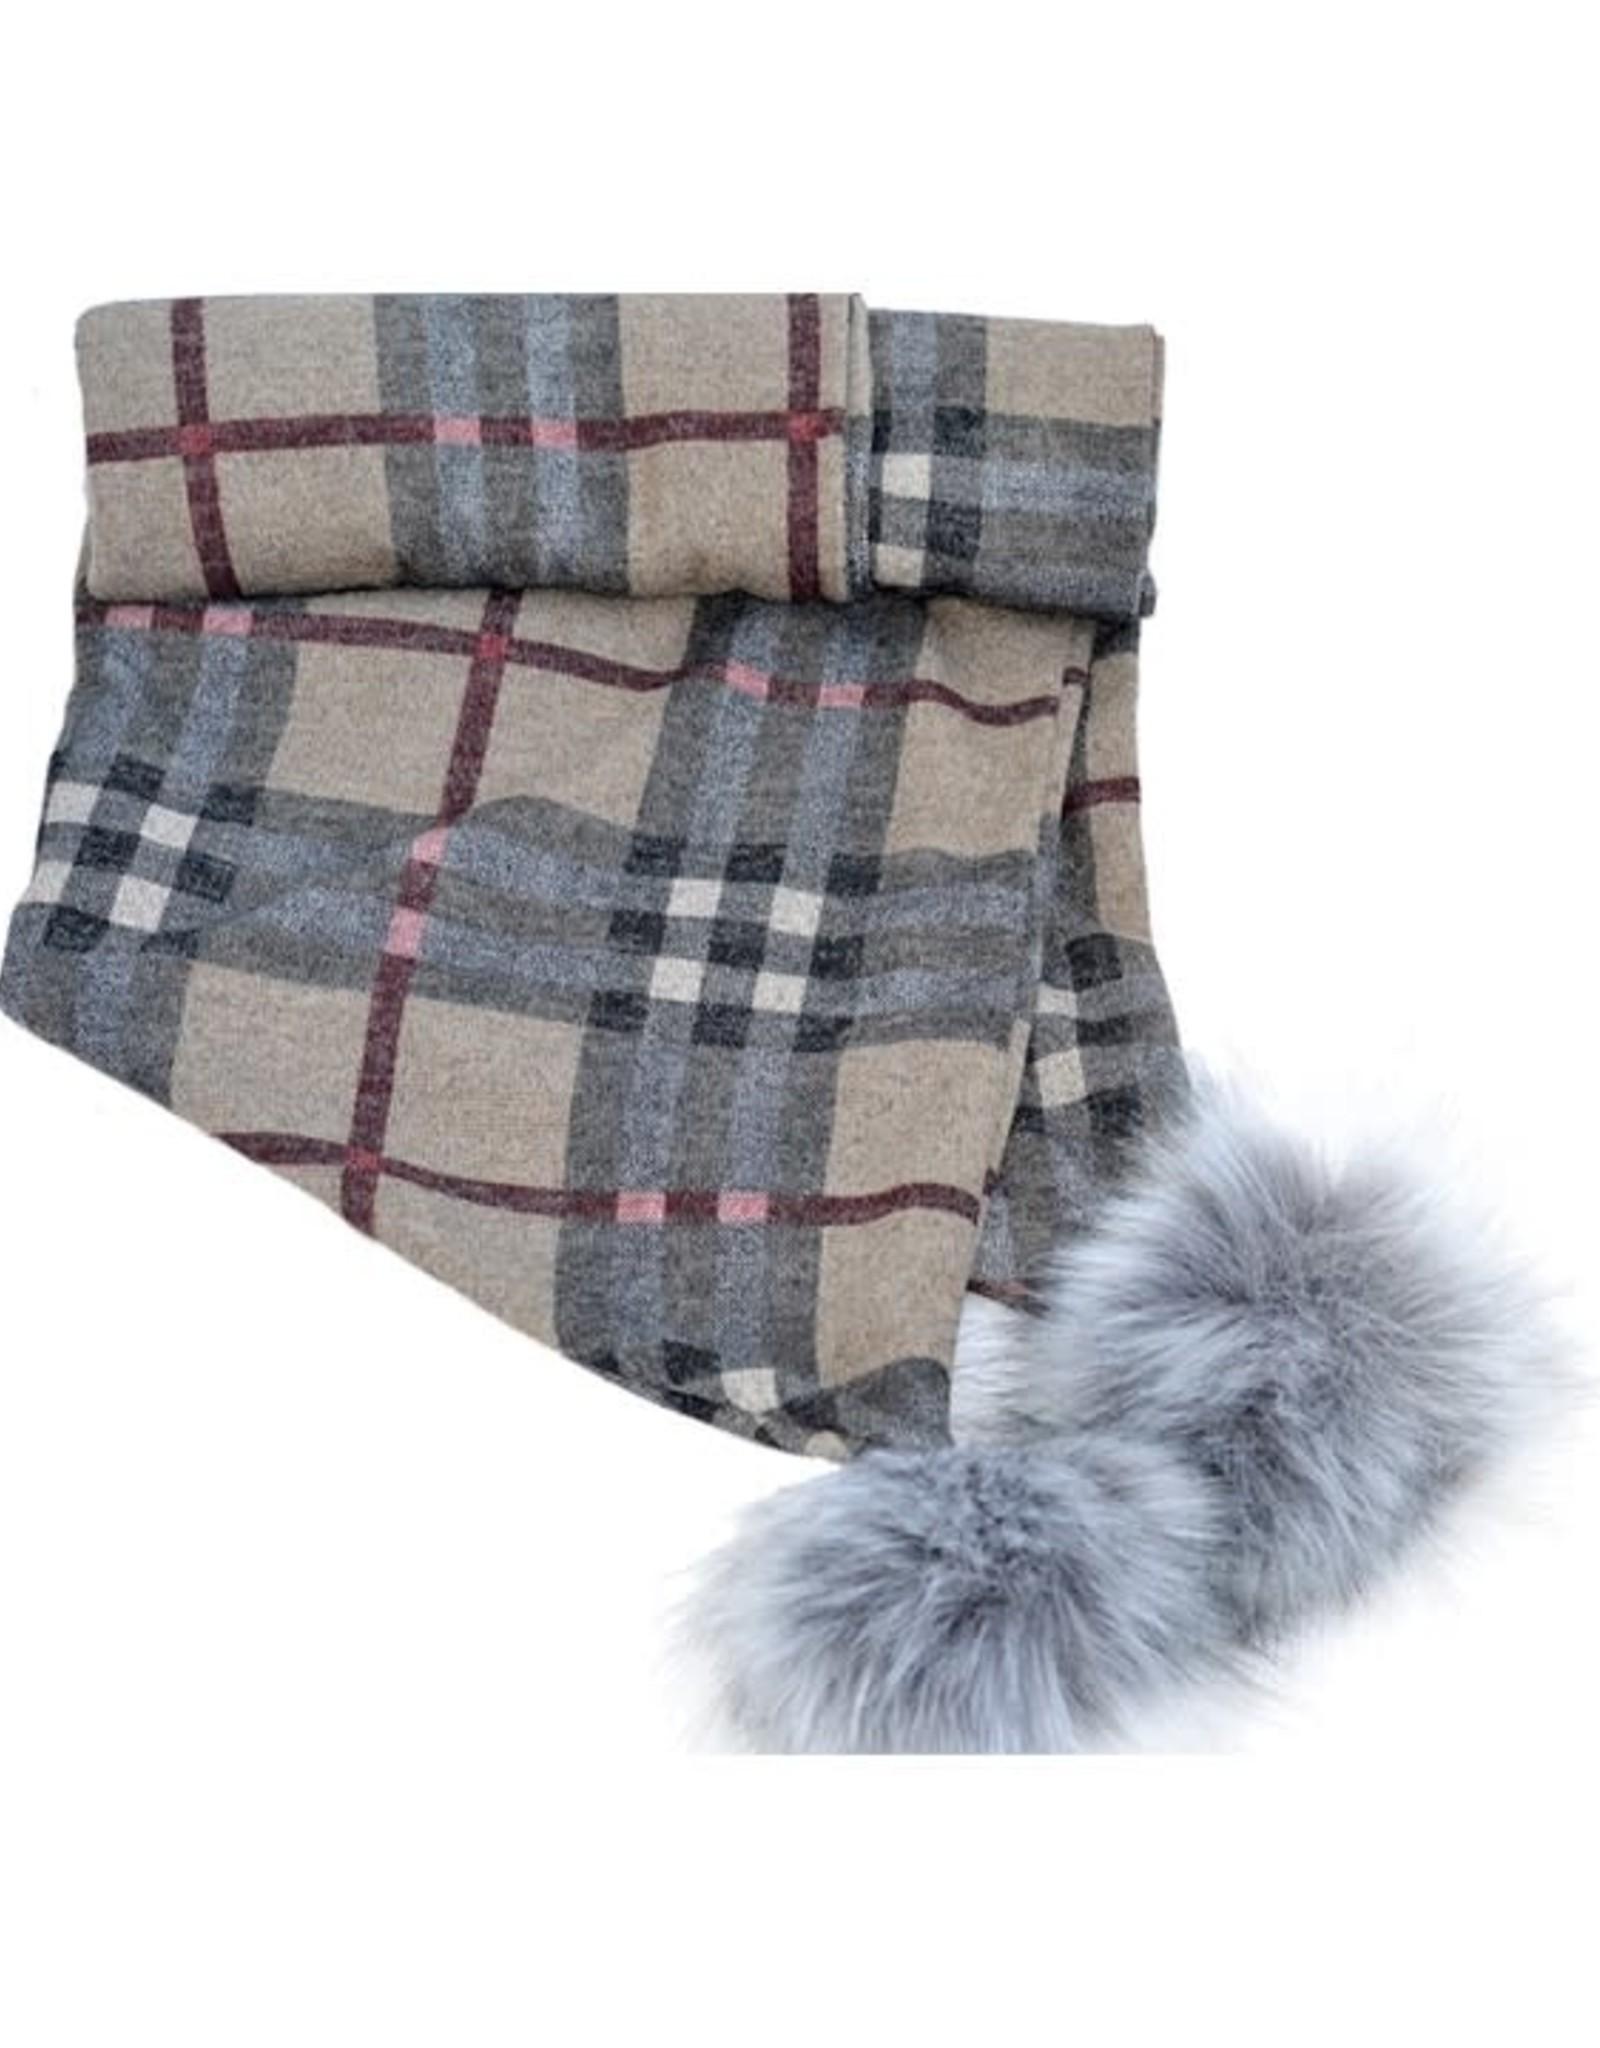 Baluchon Grand foulard + pompon # 1610-1333